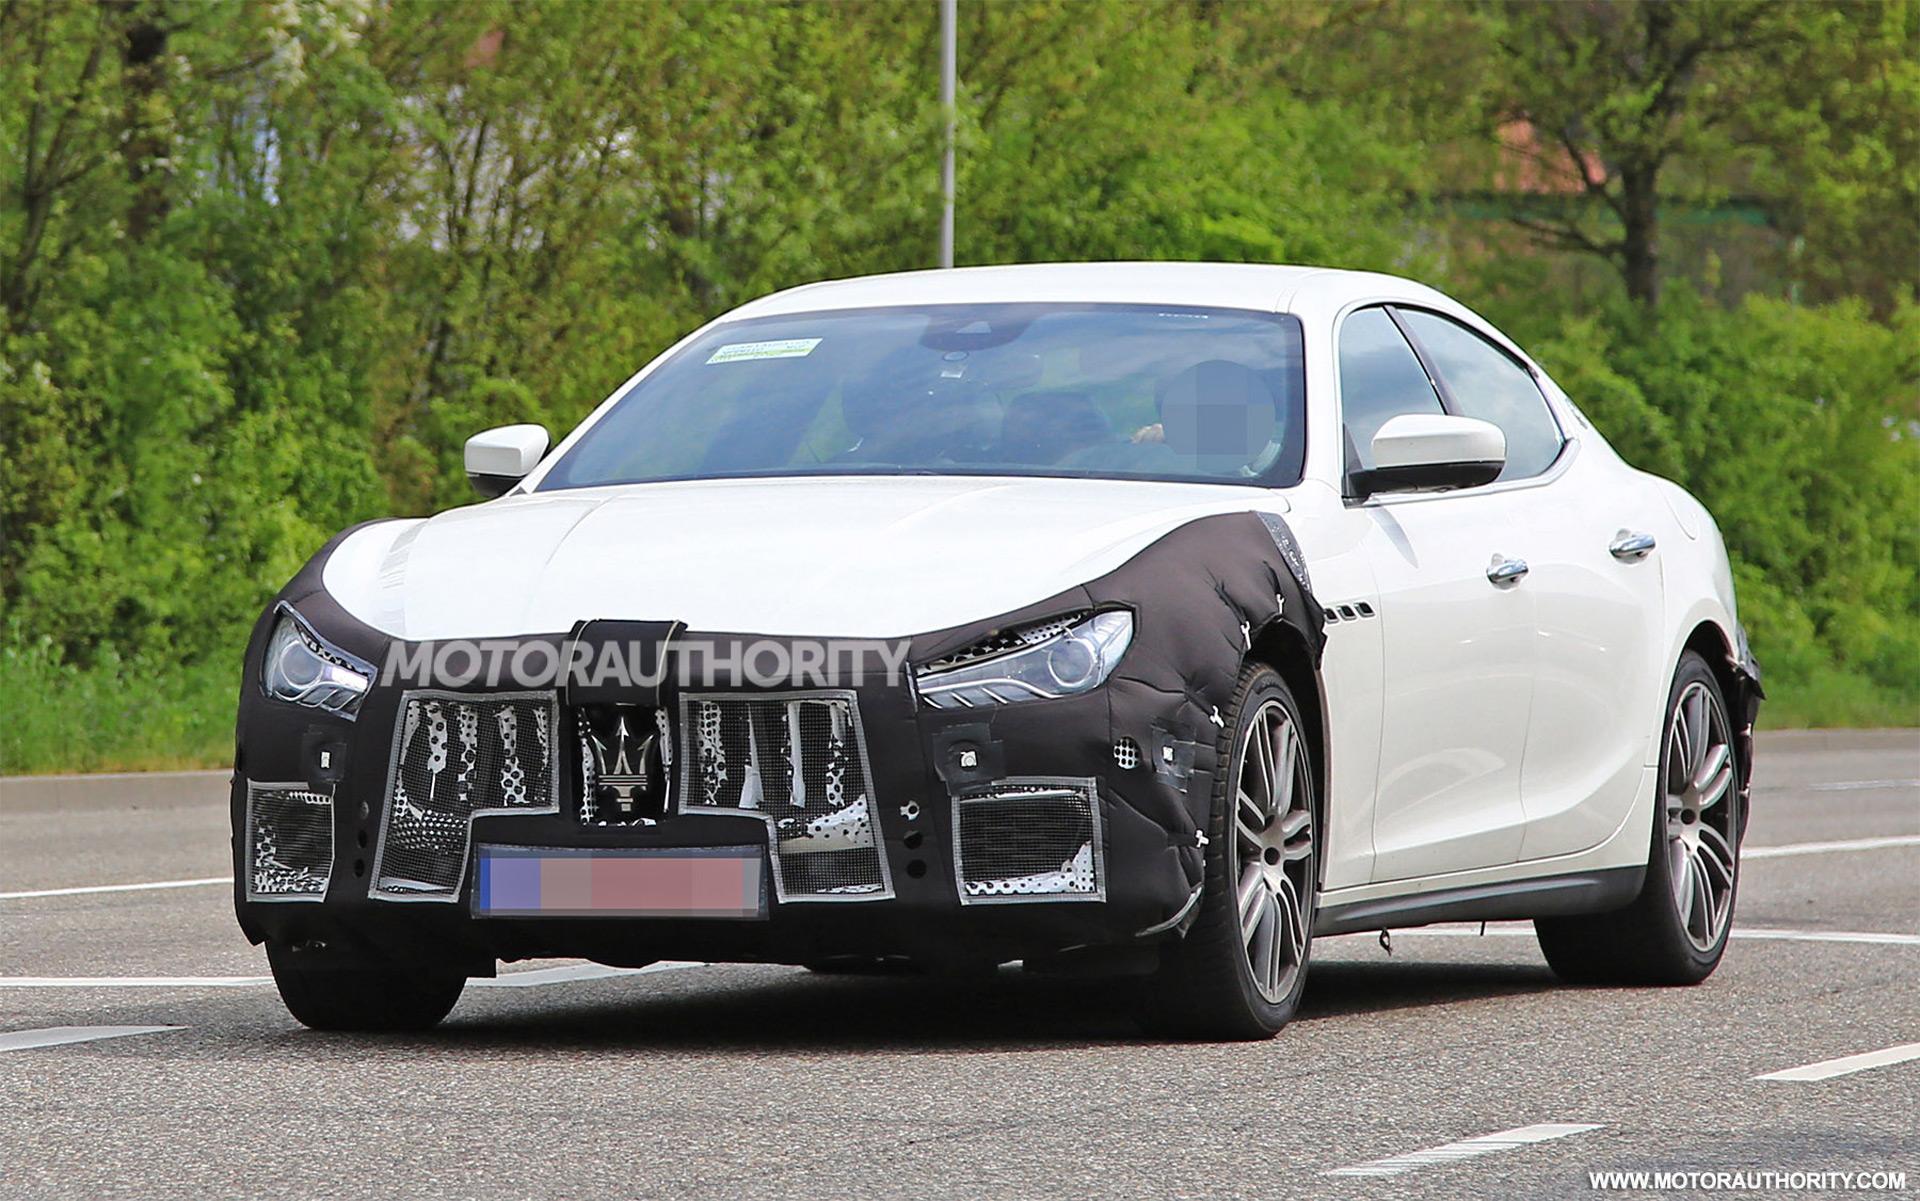 2018 Maserati Ghibli Spy Shots